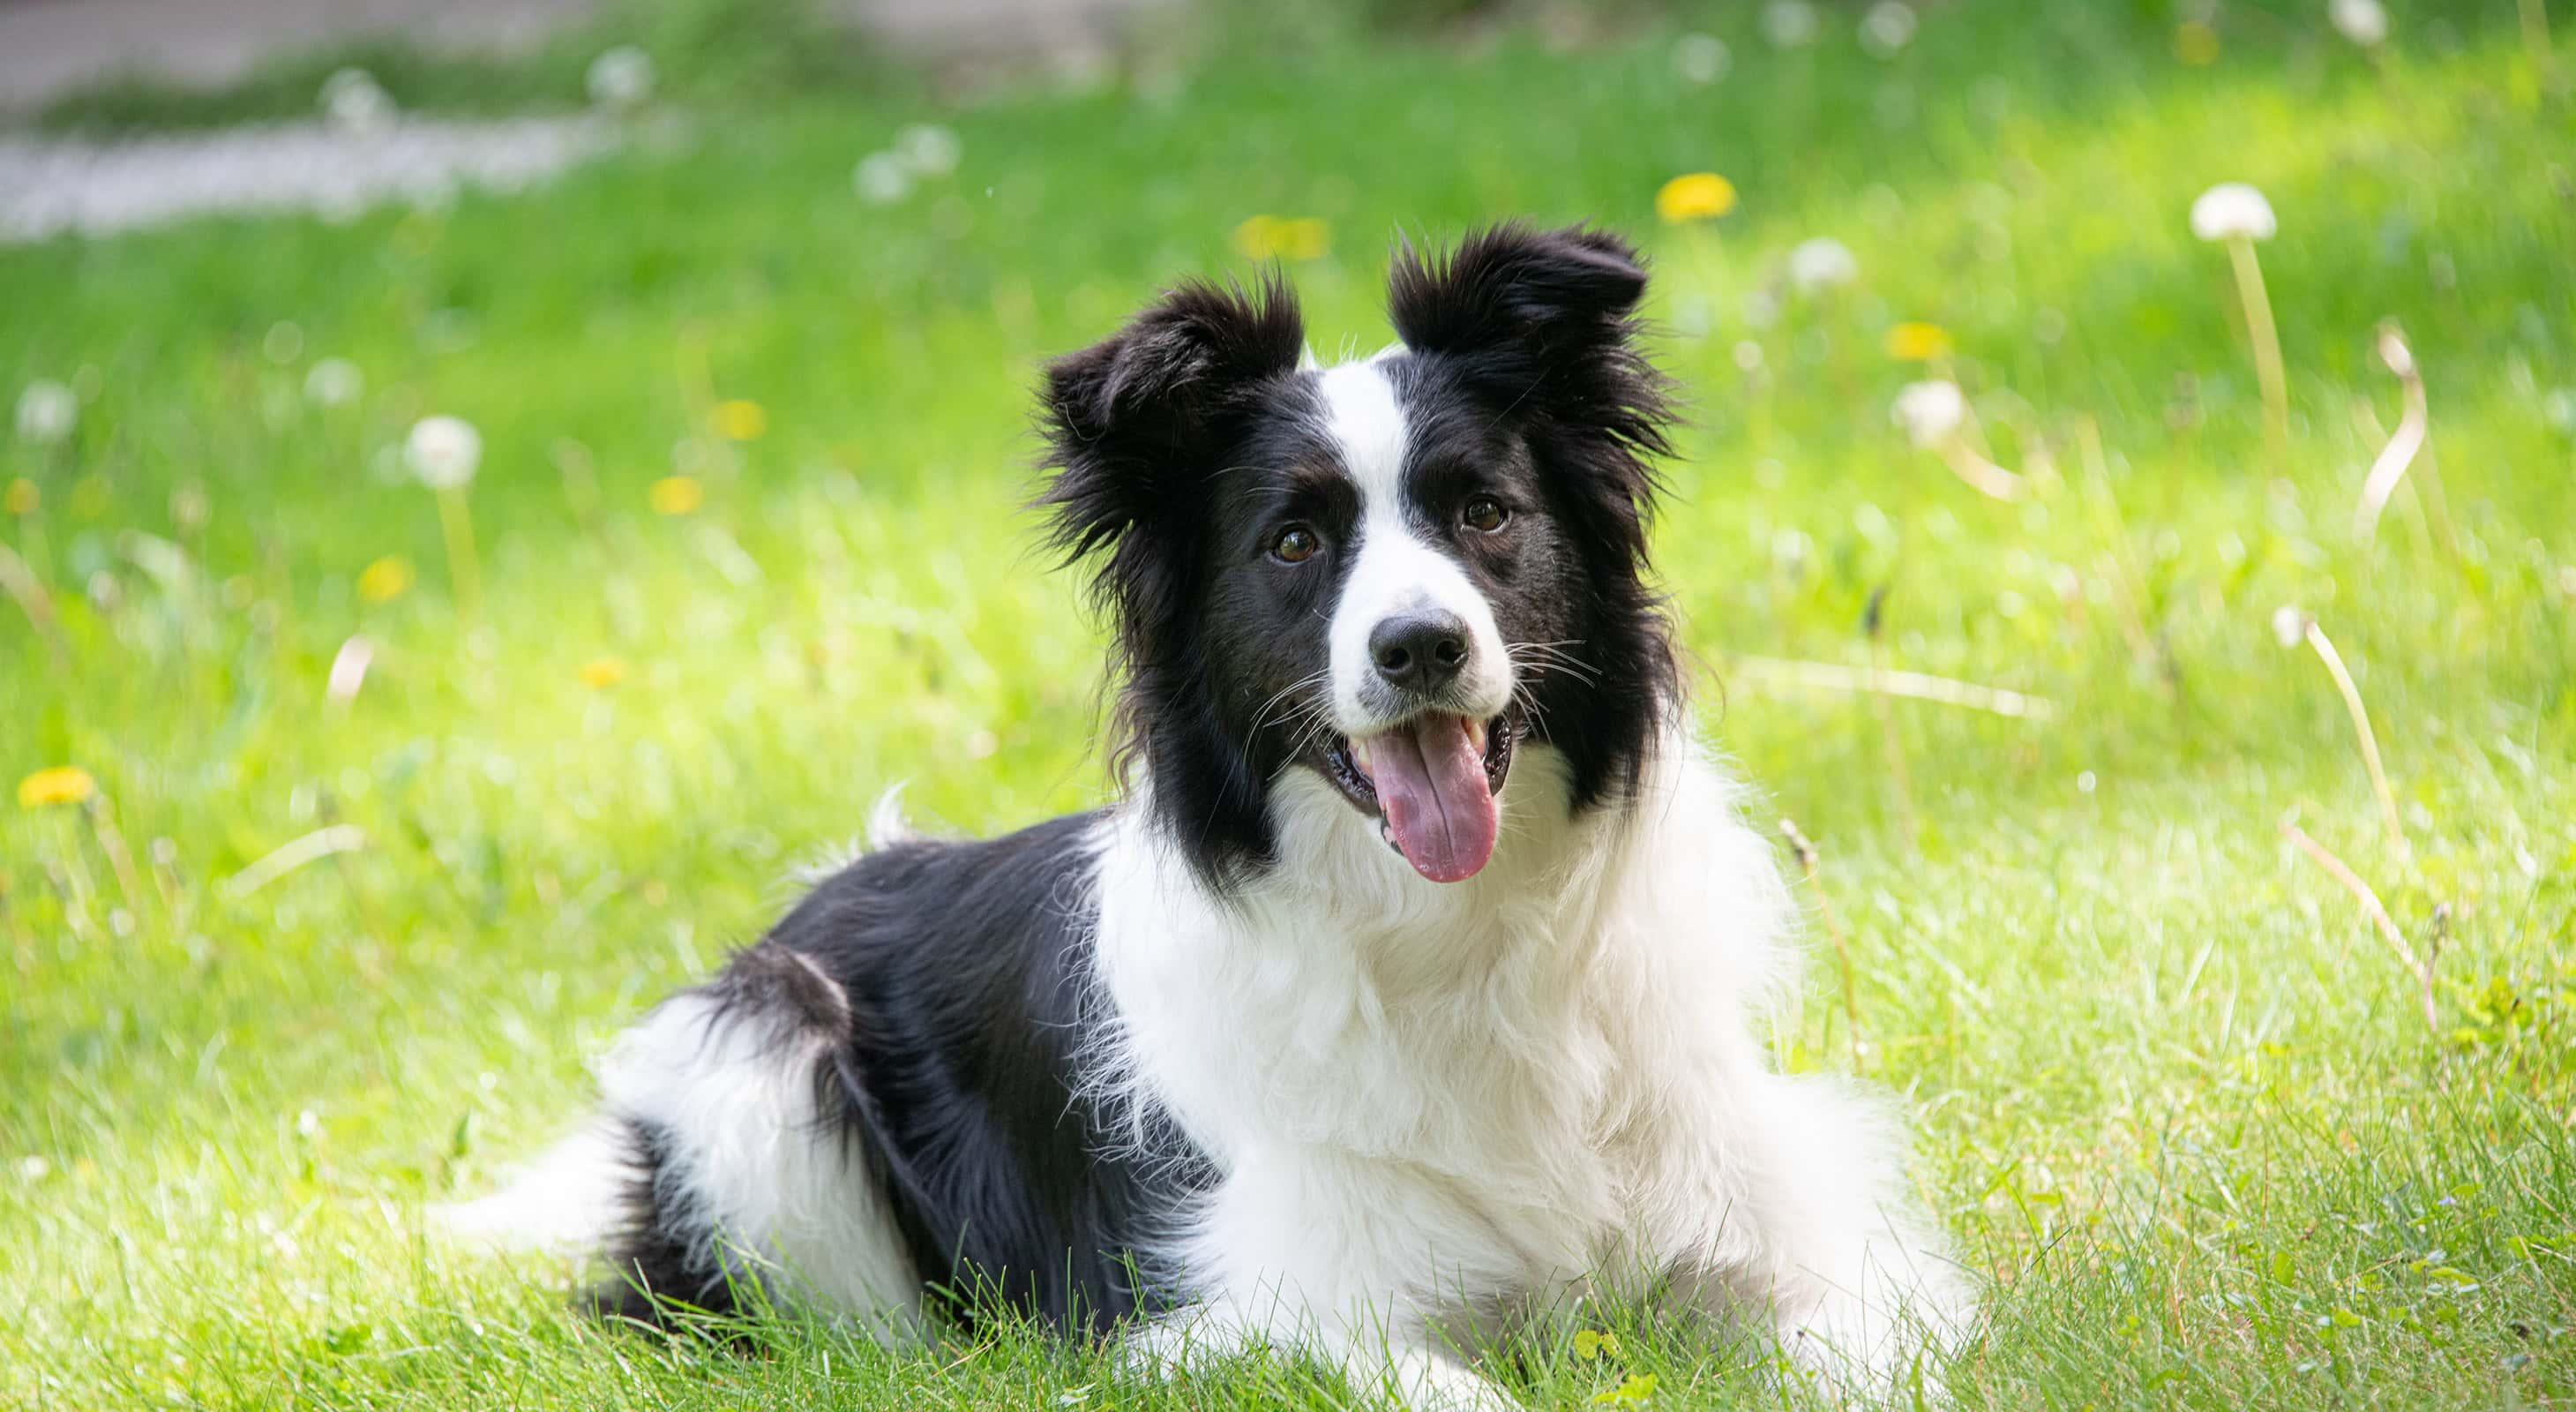 Happy dog in green grass